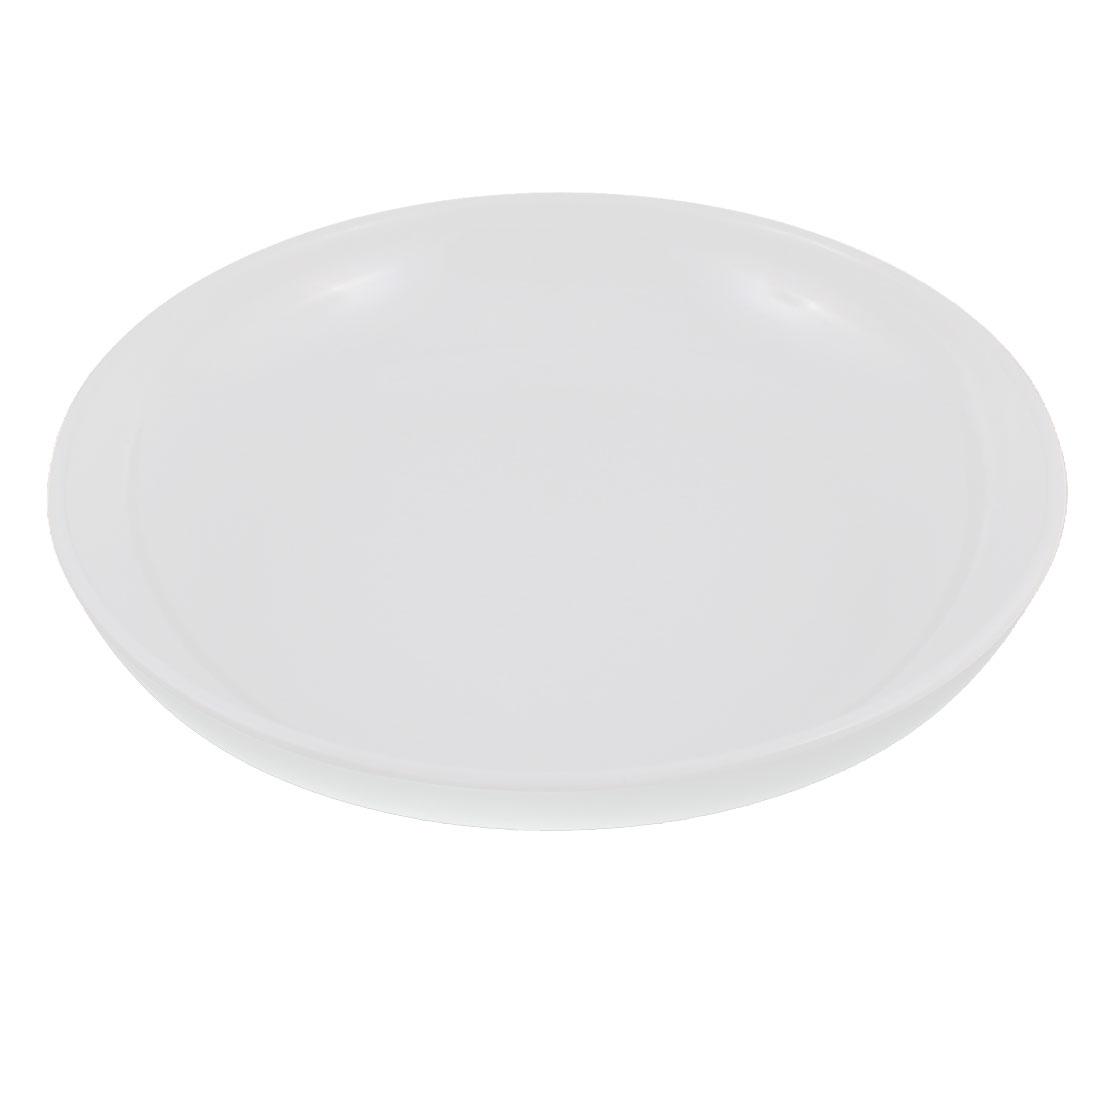 "Dinnerware Round Shape Dinner Dish Serving Plate White 8"" Dia"